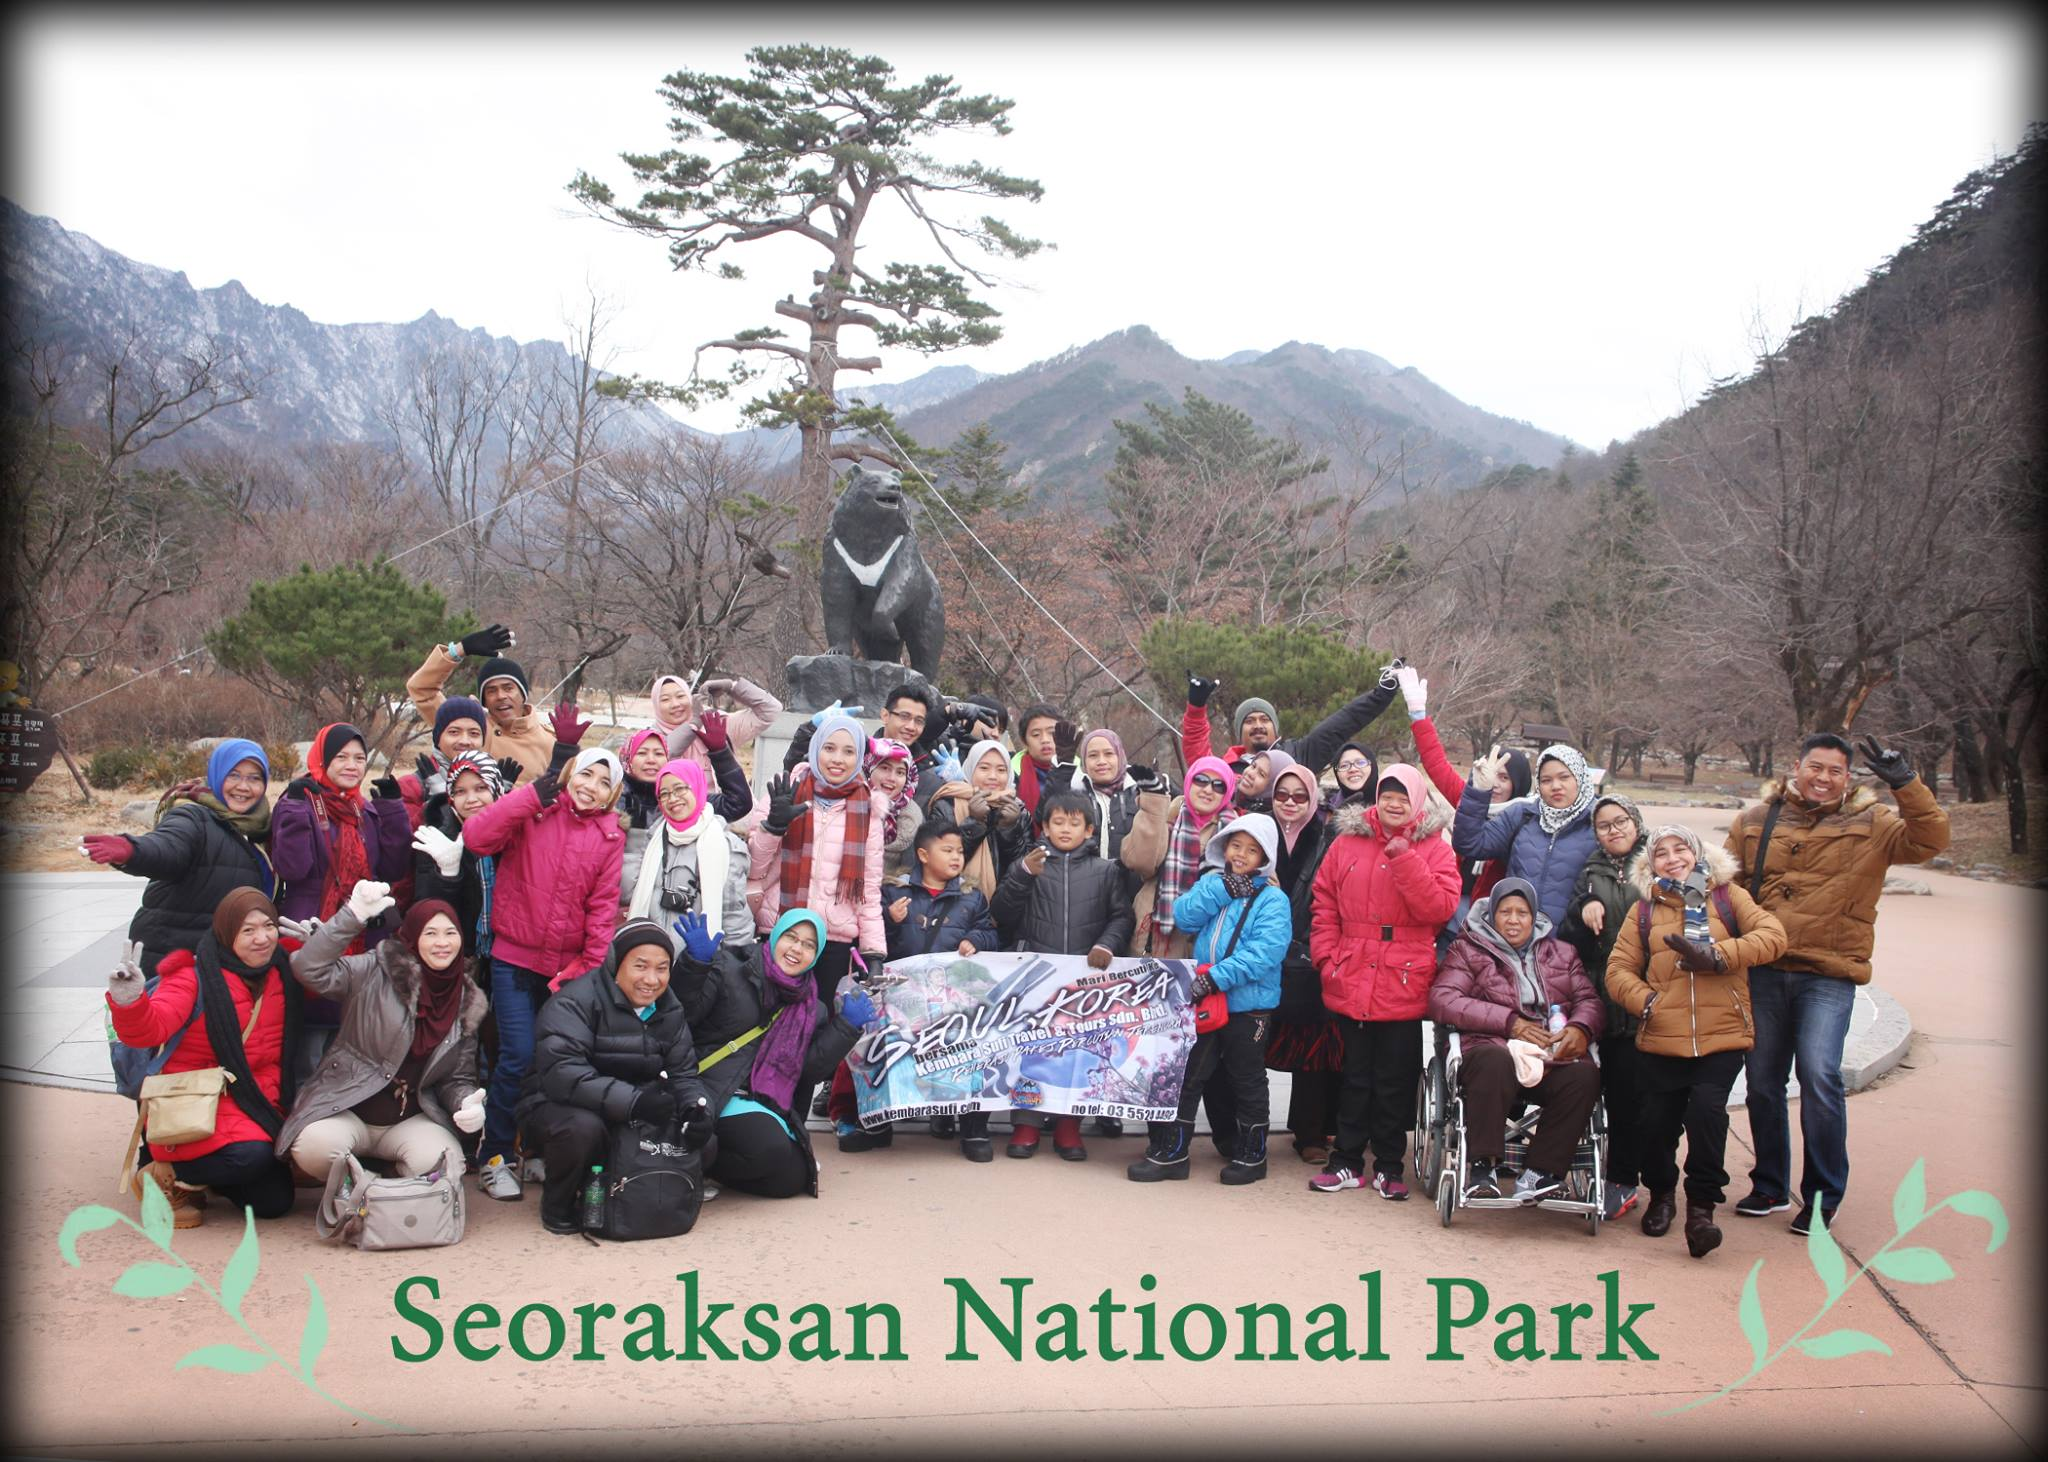 KOREA TRIP_WINTER DI KOREA_KEMBARA SUFI TRAVEL & TOURS (2)